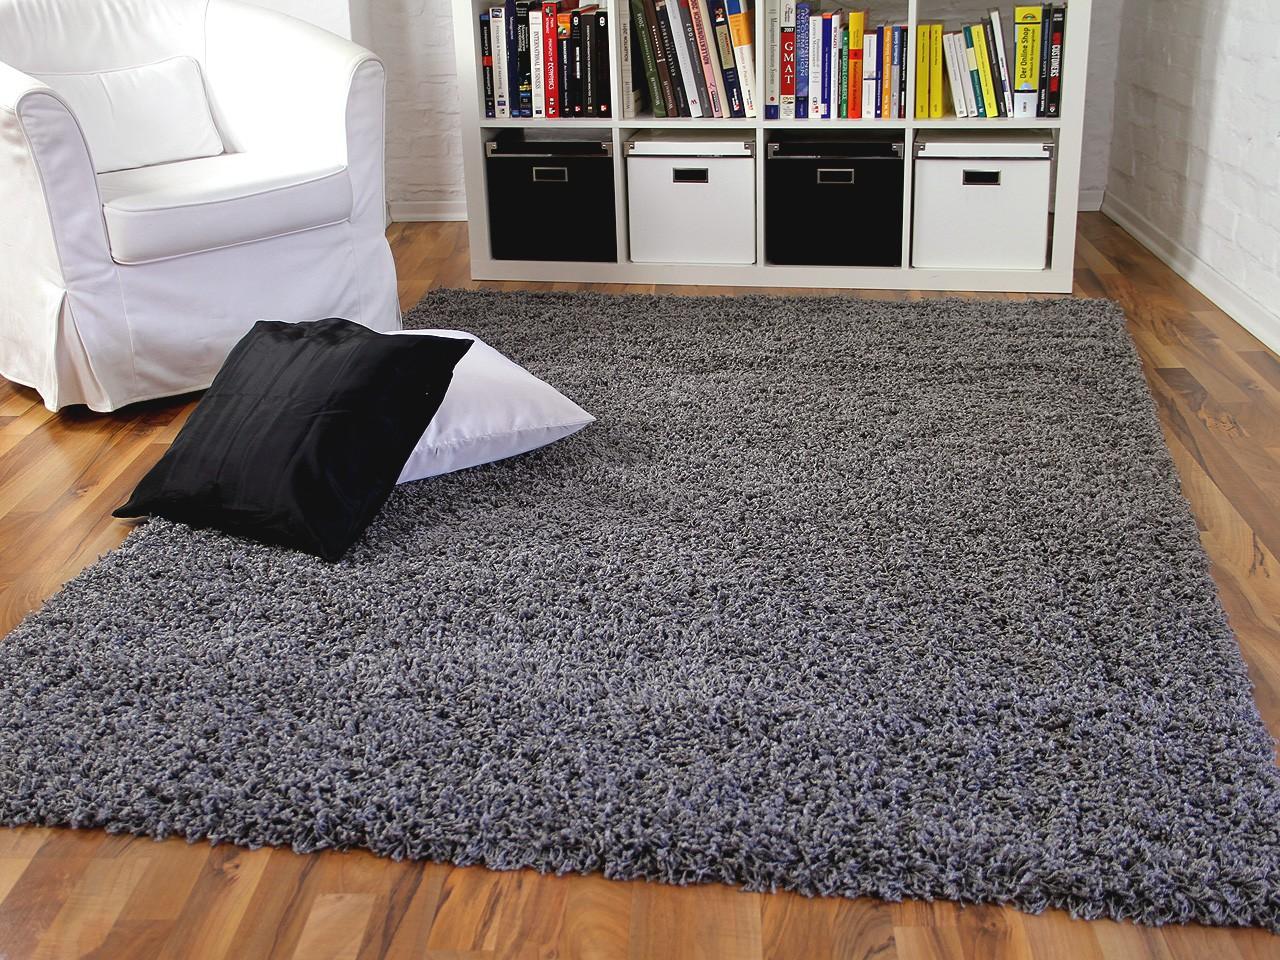 hochflor langflor shaggy teppich aloha anthrazit teppiche. Black Bedroom Furniture Sets. Home Design Ideas